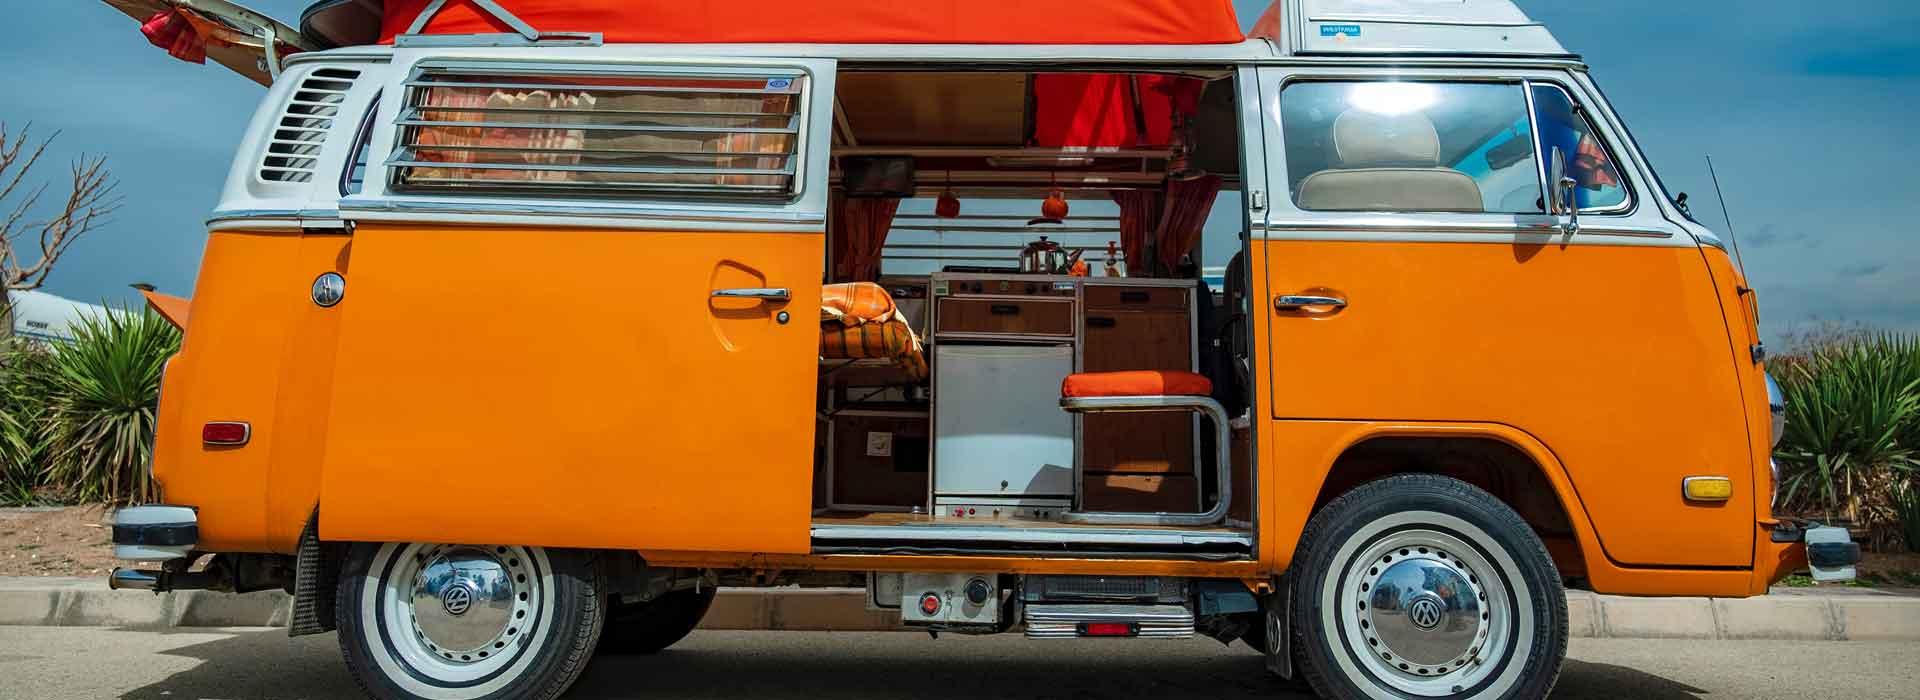 caravans and motorhomes business coaching image of caravan